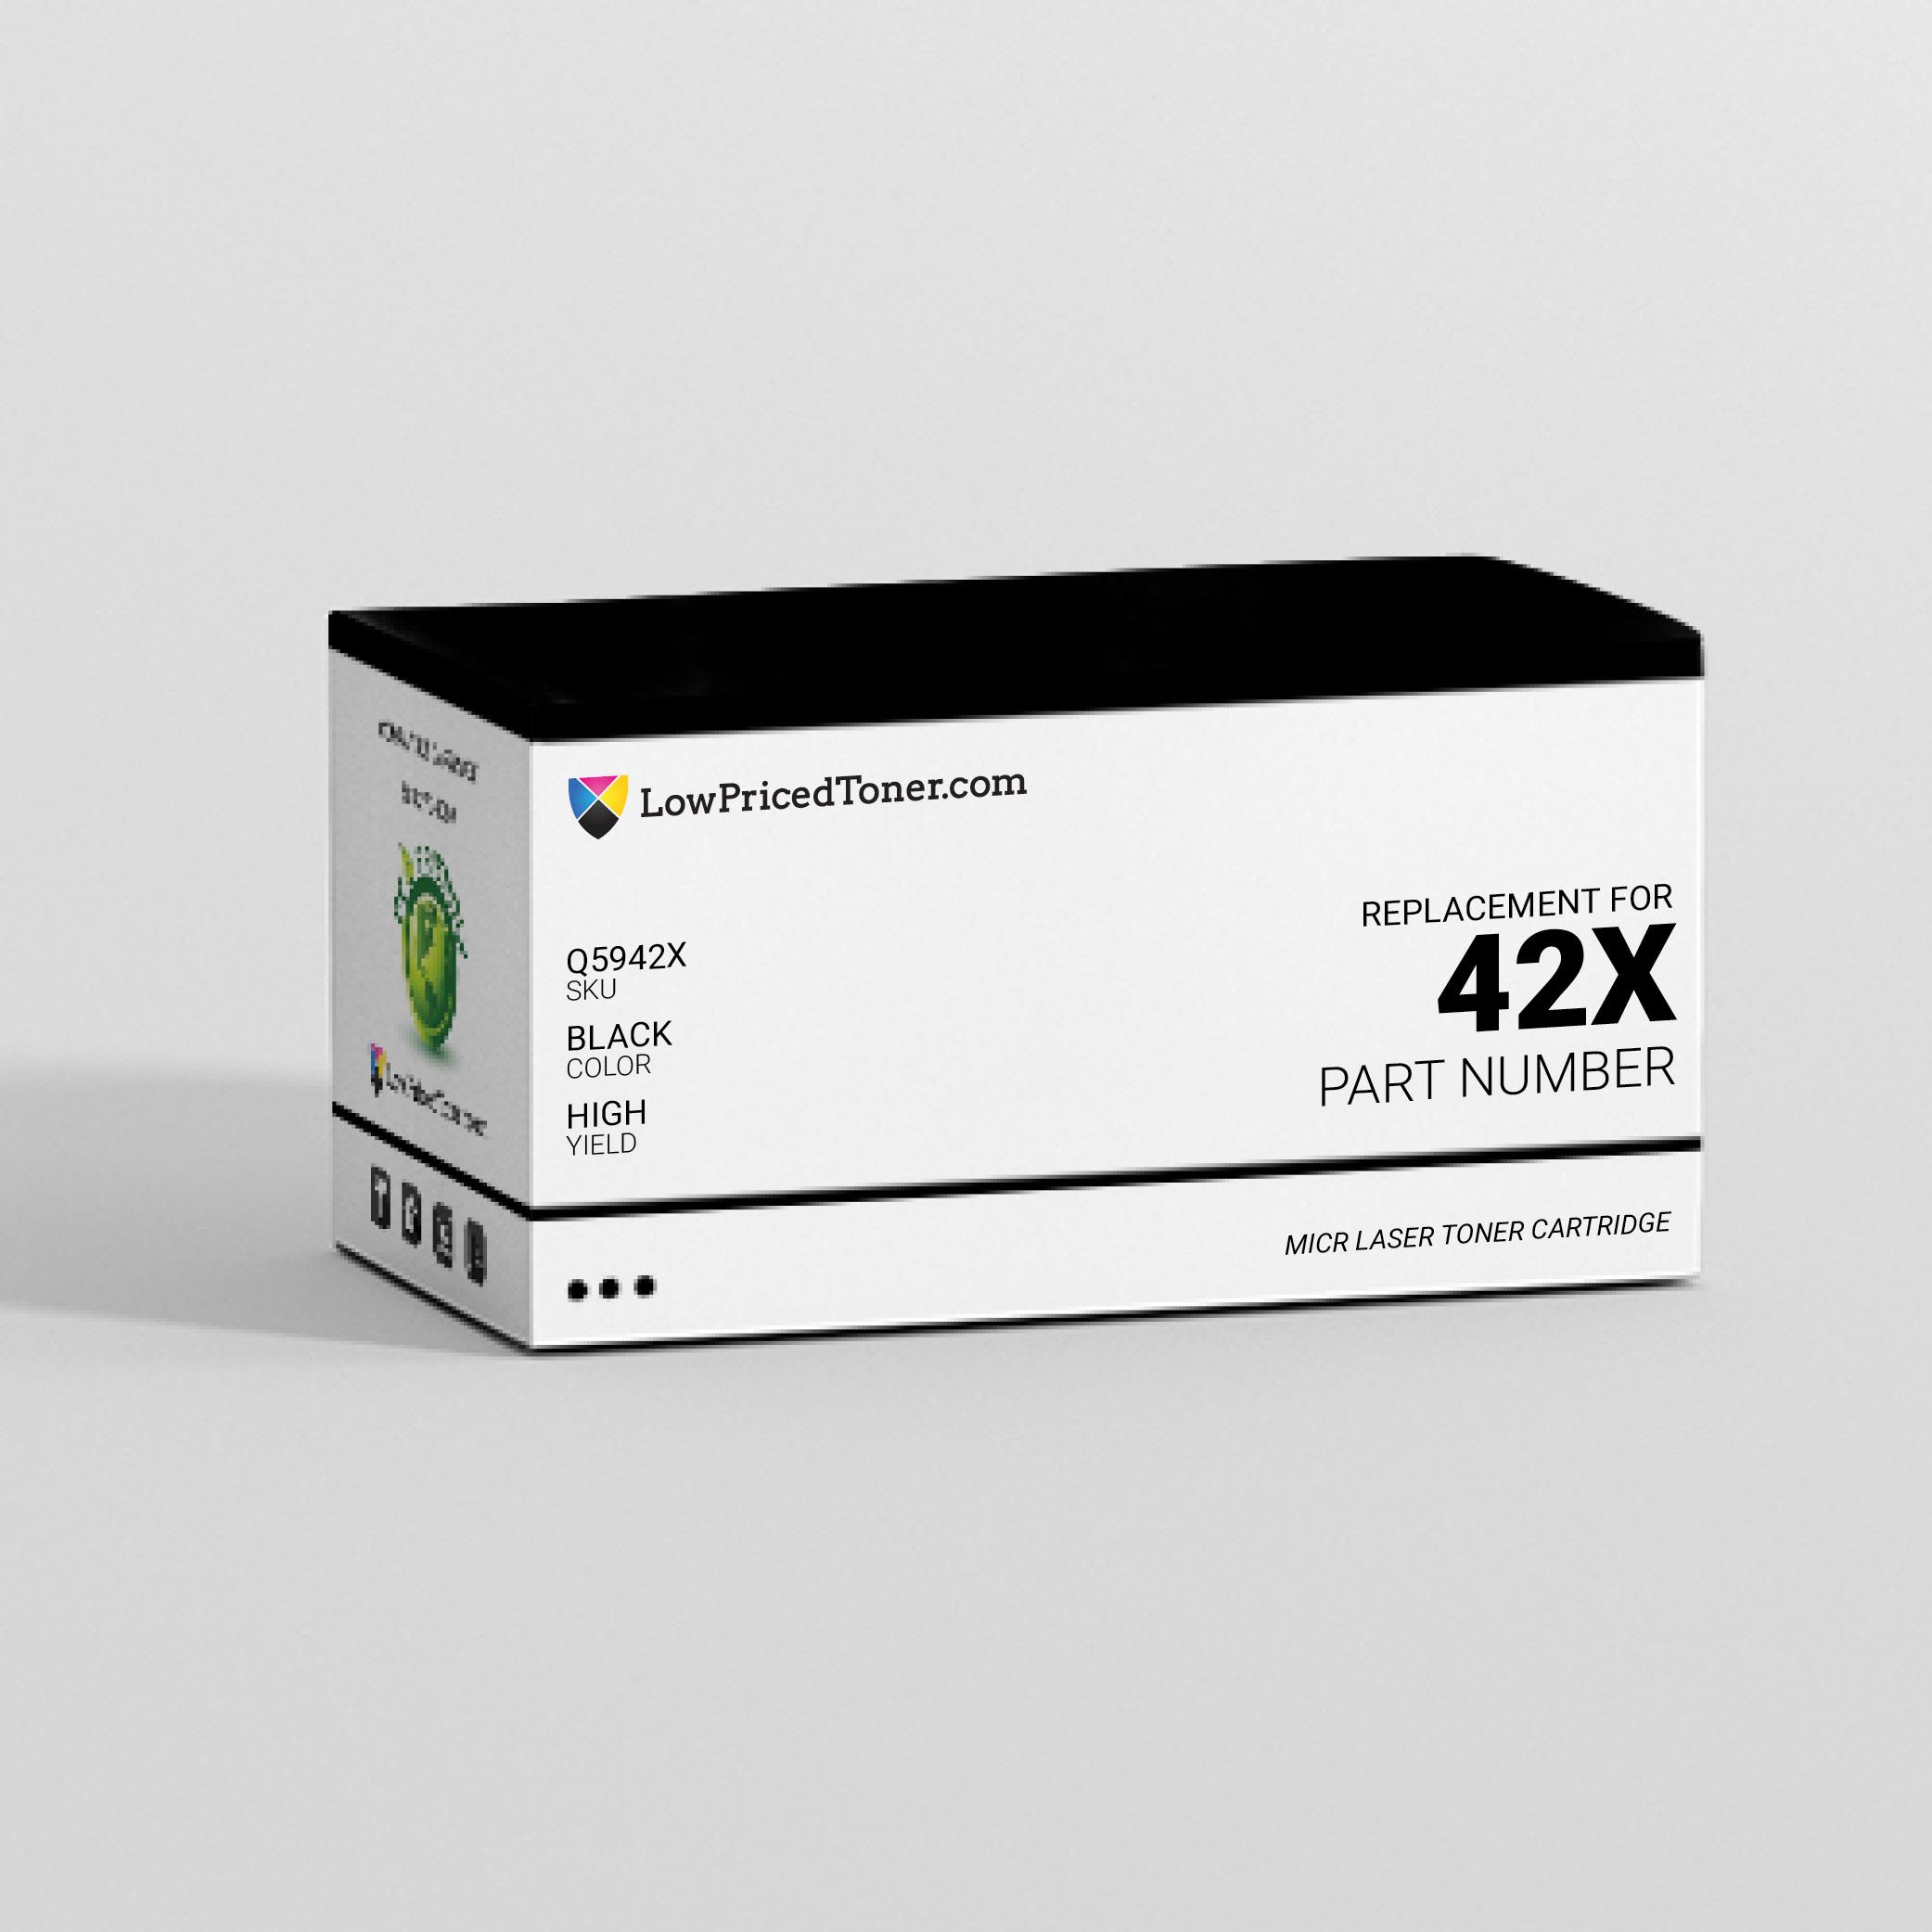 HP Q5942X 42X Remanufactured Black MICR Laser Toner Cartridge High Yield